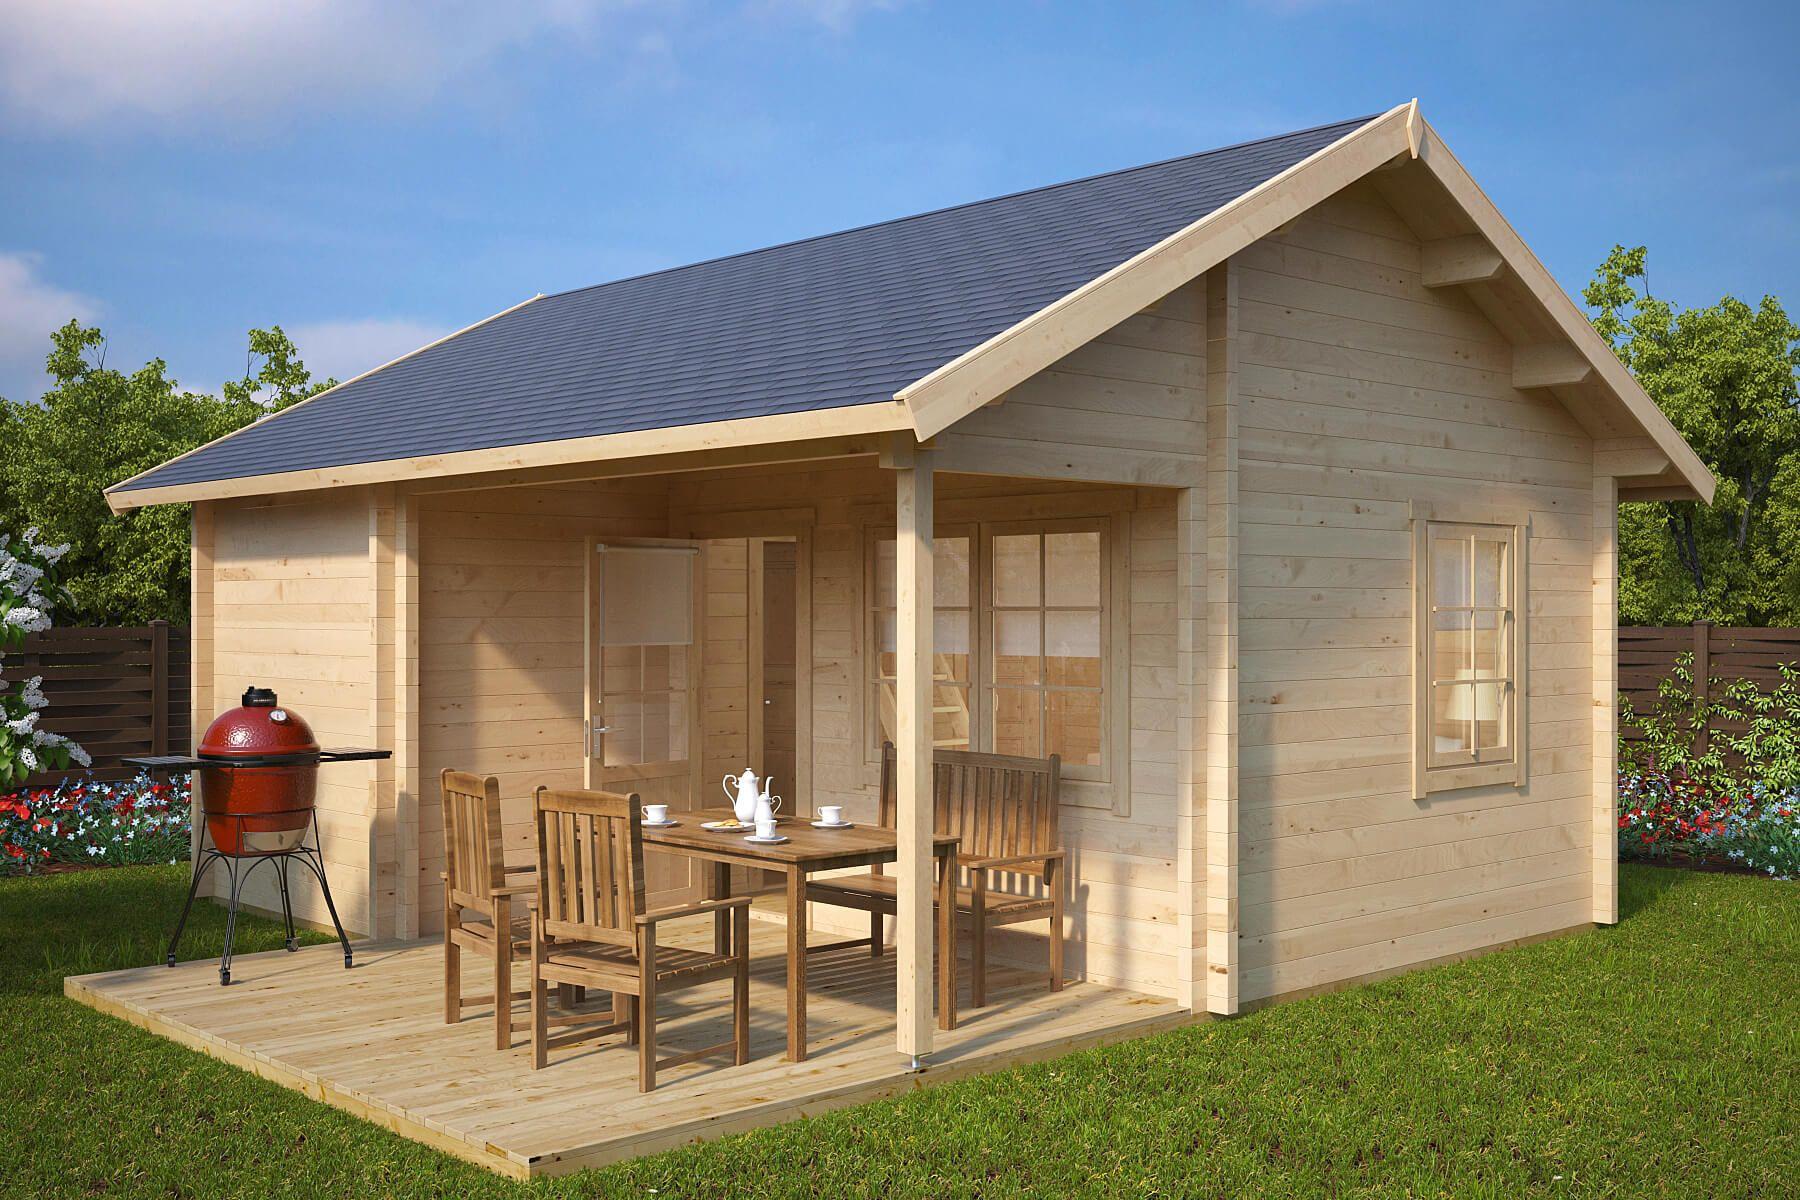 Grosses Gartenhaus Mit Terrasse Oklahoma 26 4m 70mm 5x6 Ferienhaus Kaufen Gartenhaus Mit Terrasse Sommerhaus